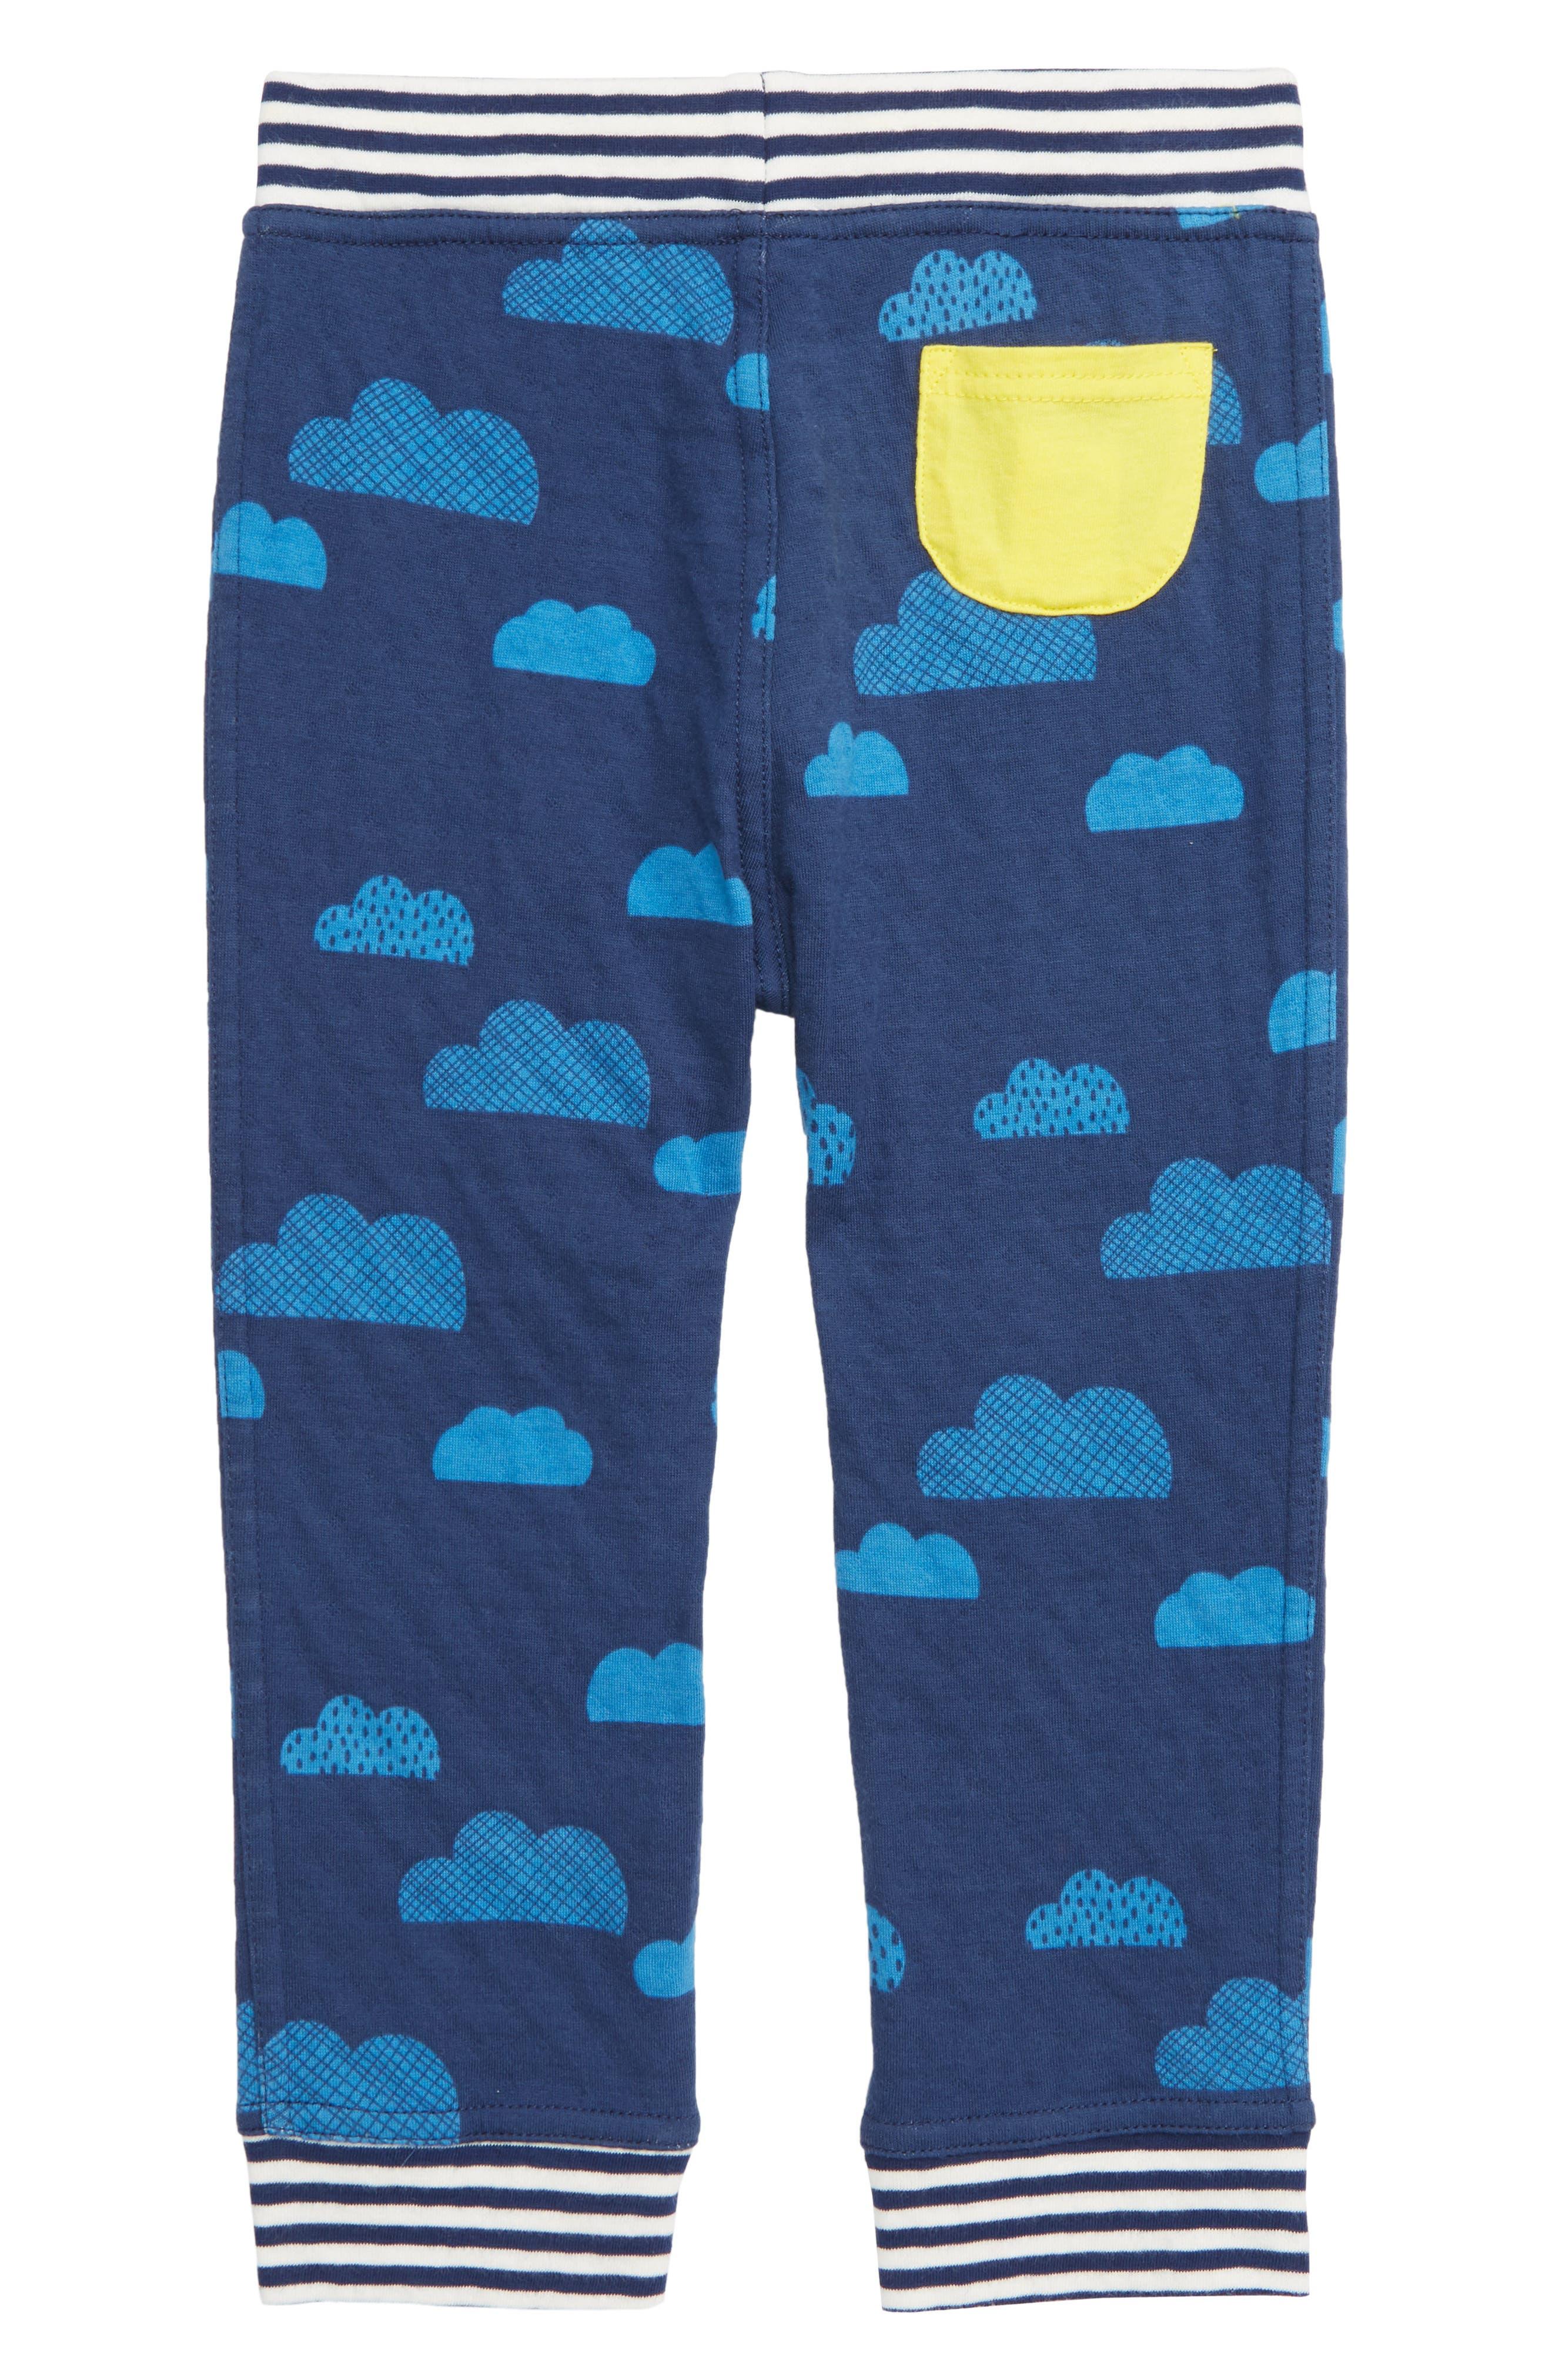 Reversible Print Pants,                             Alternate thumbnail 2, color,                             NAV COLLEGE BLUE CLOUDS